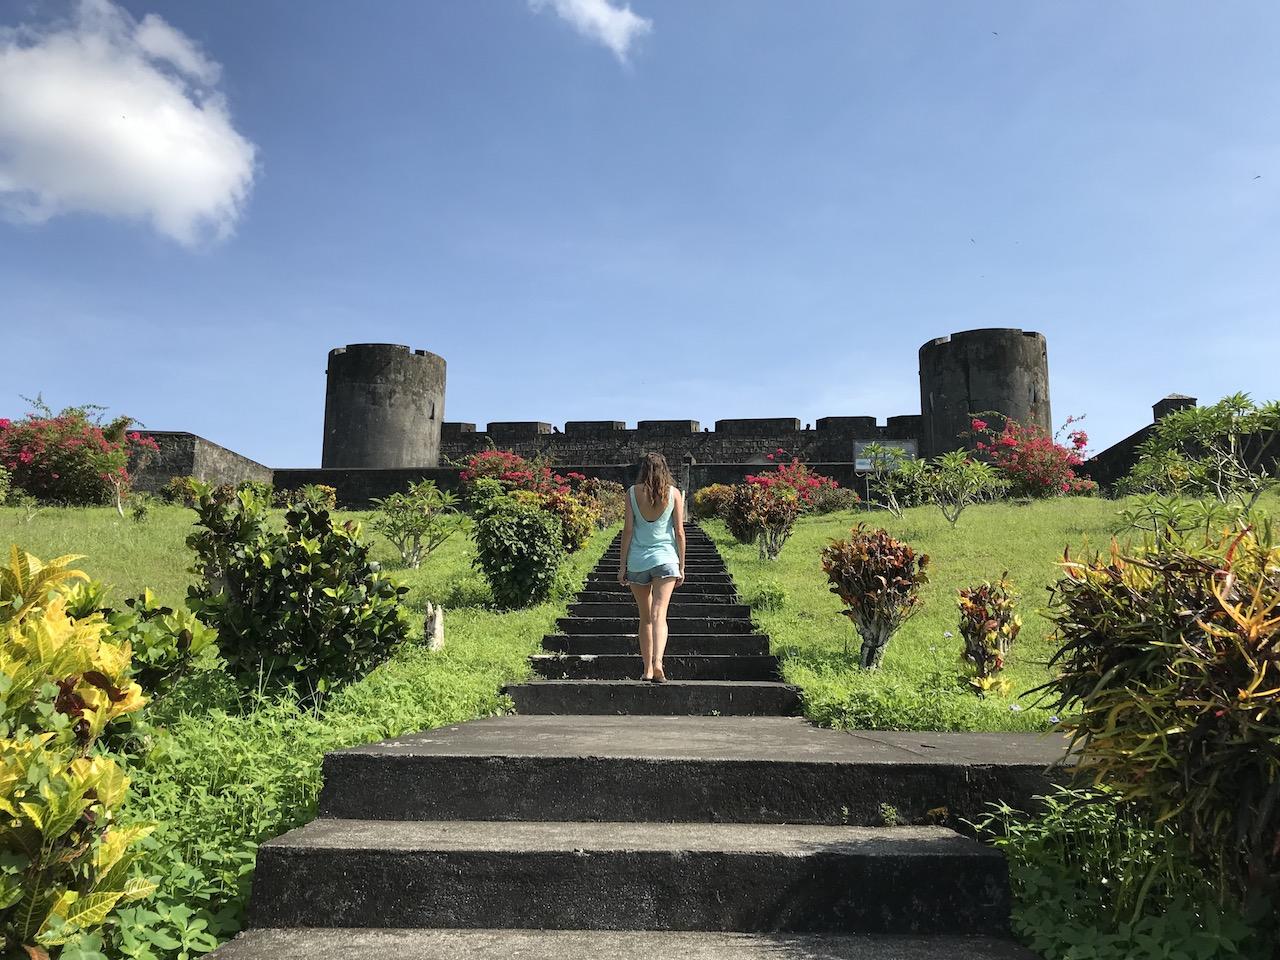 Banda-Inseln-Banda-Neira-Fort Belgica